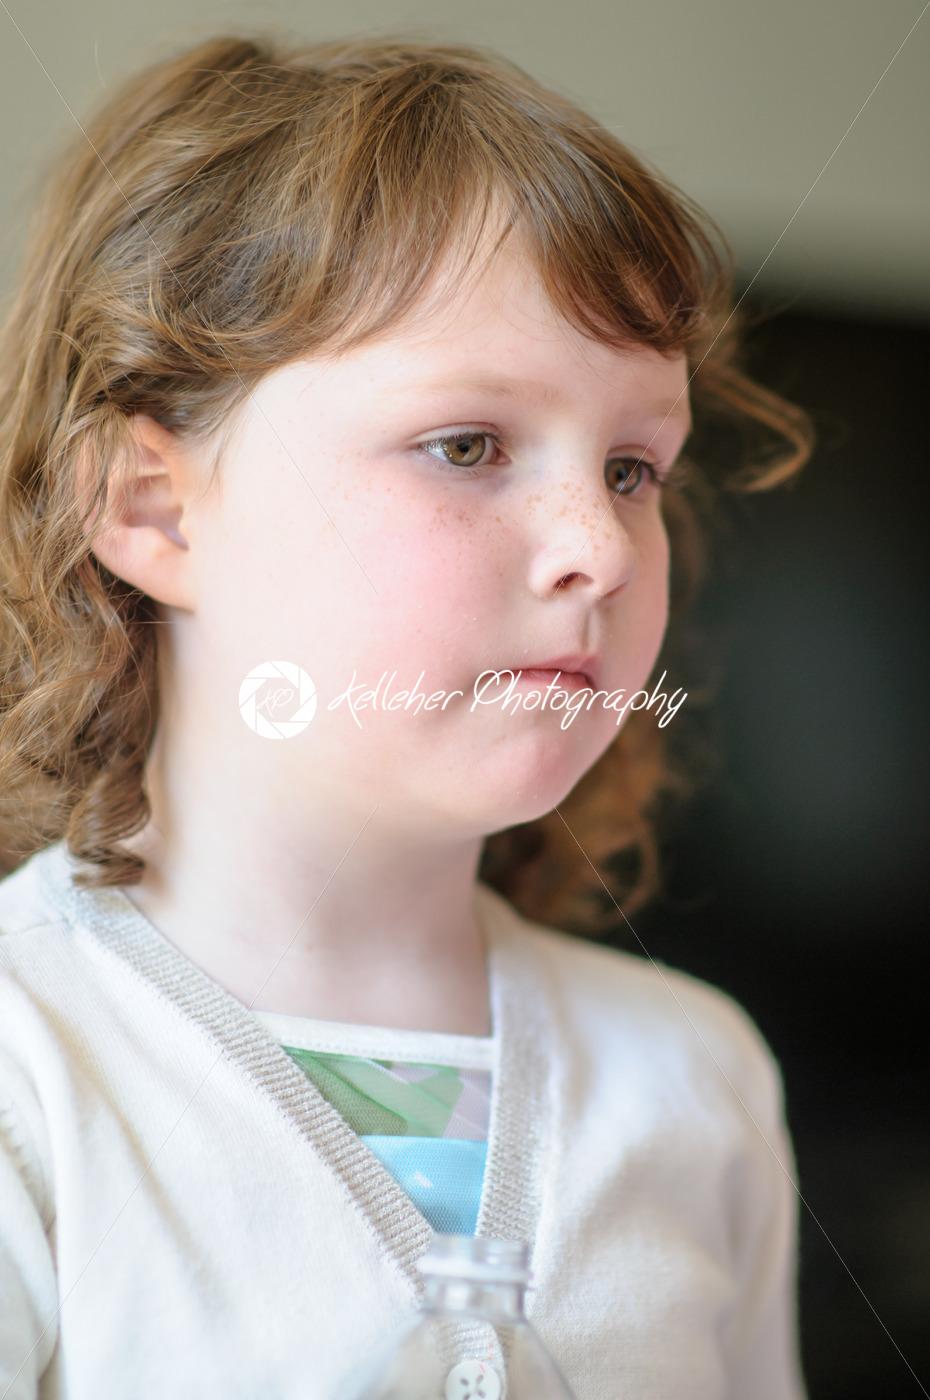 Portrait of a cute little girl inside - Kelleher Photography Store